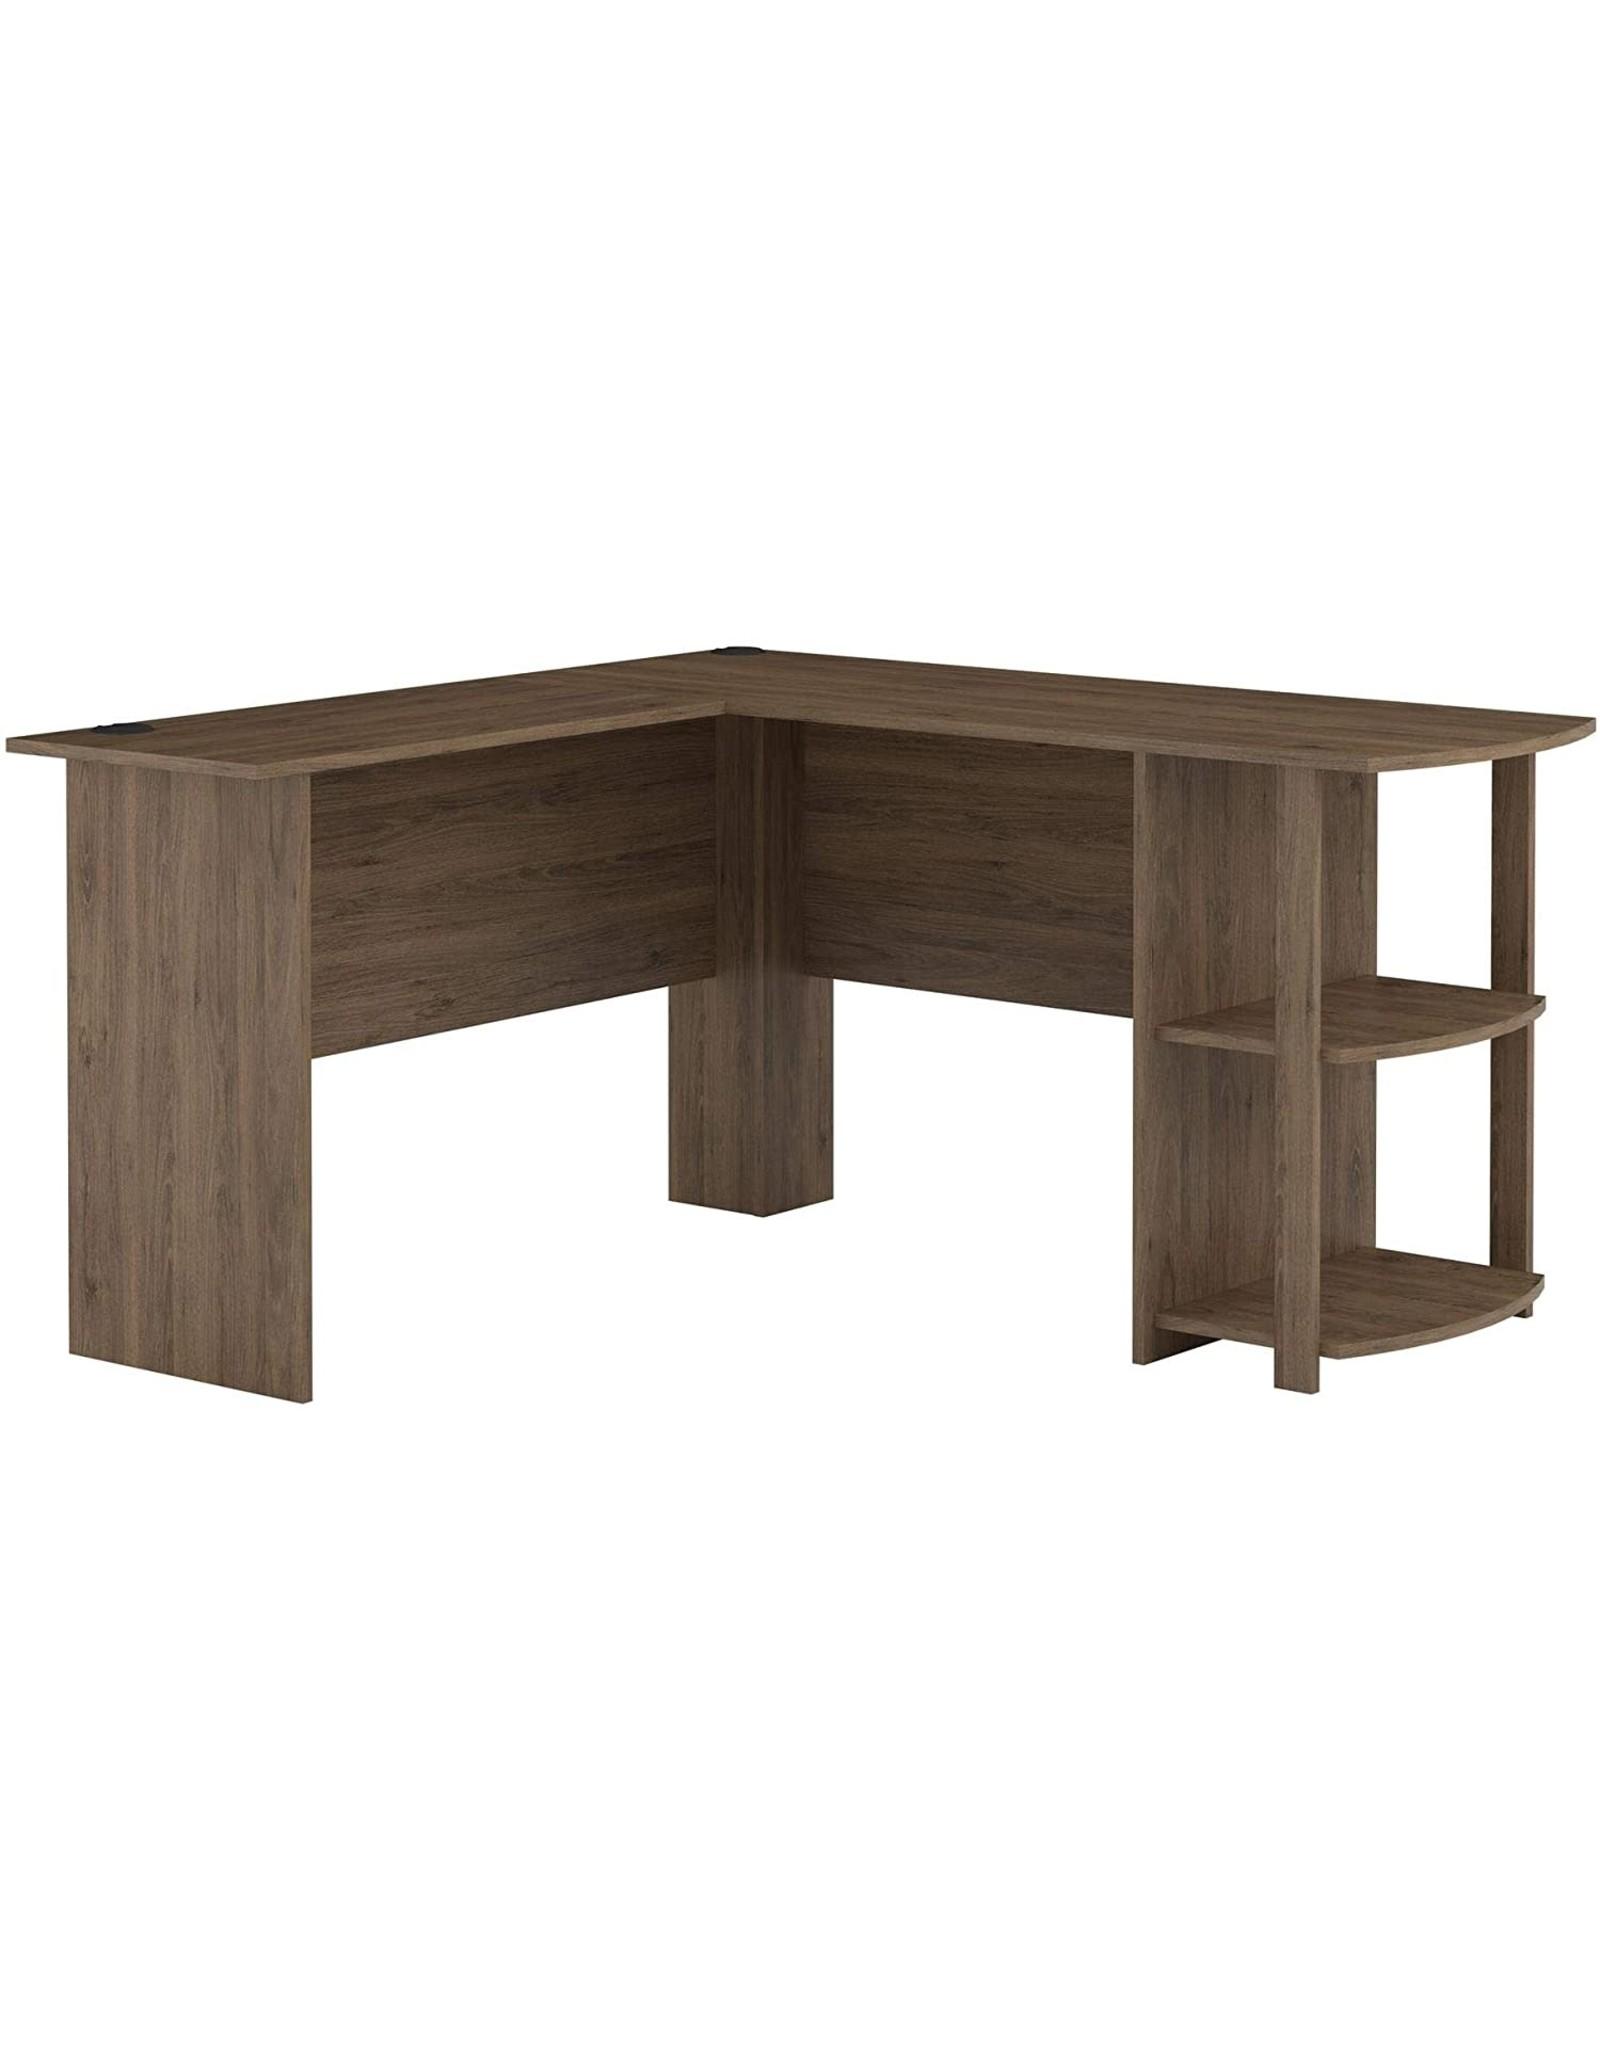 Ameriwood Home Ameriwood Home Dakota L-Shaped Desk with Bookshelves, Rustic Oak